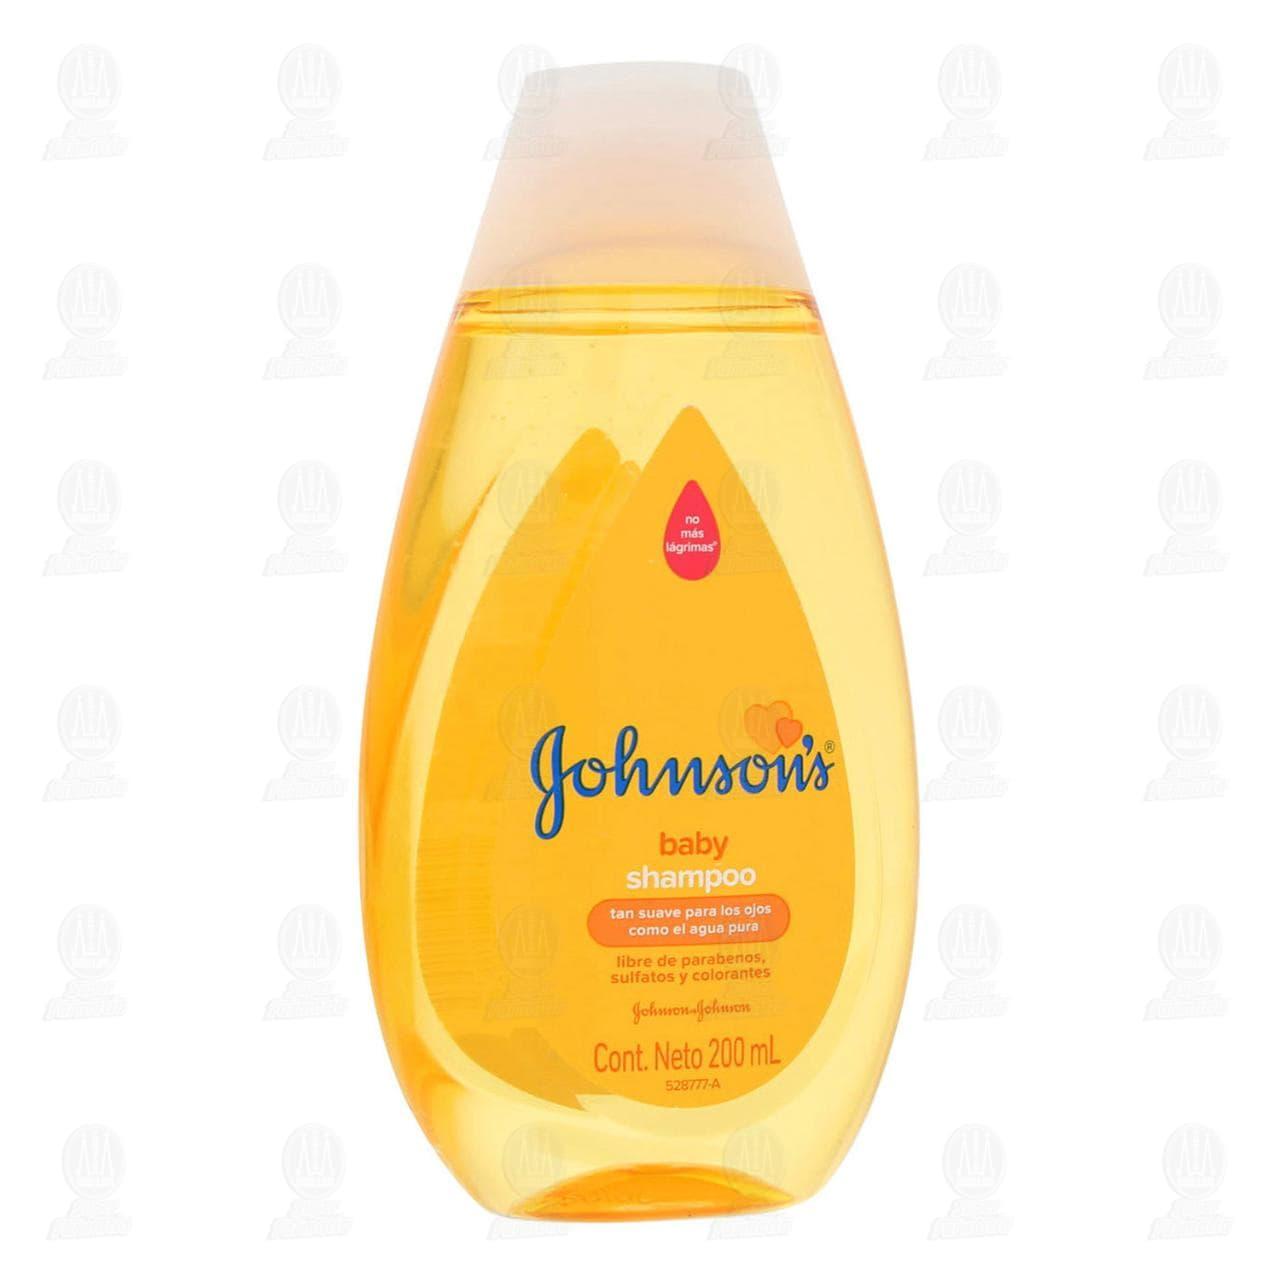 Shampoo para Bebé Johnson's Baby con pH Balanceado, 200 ml.